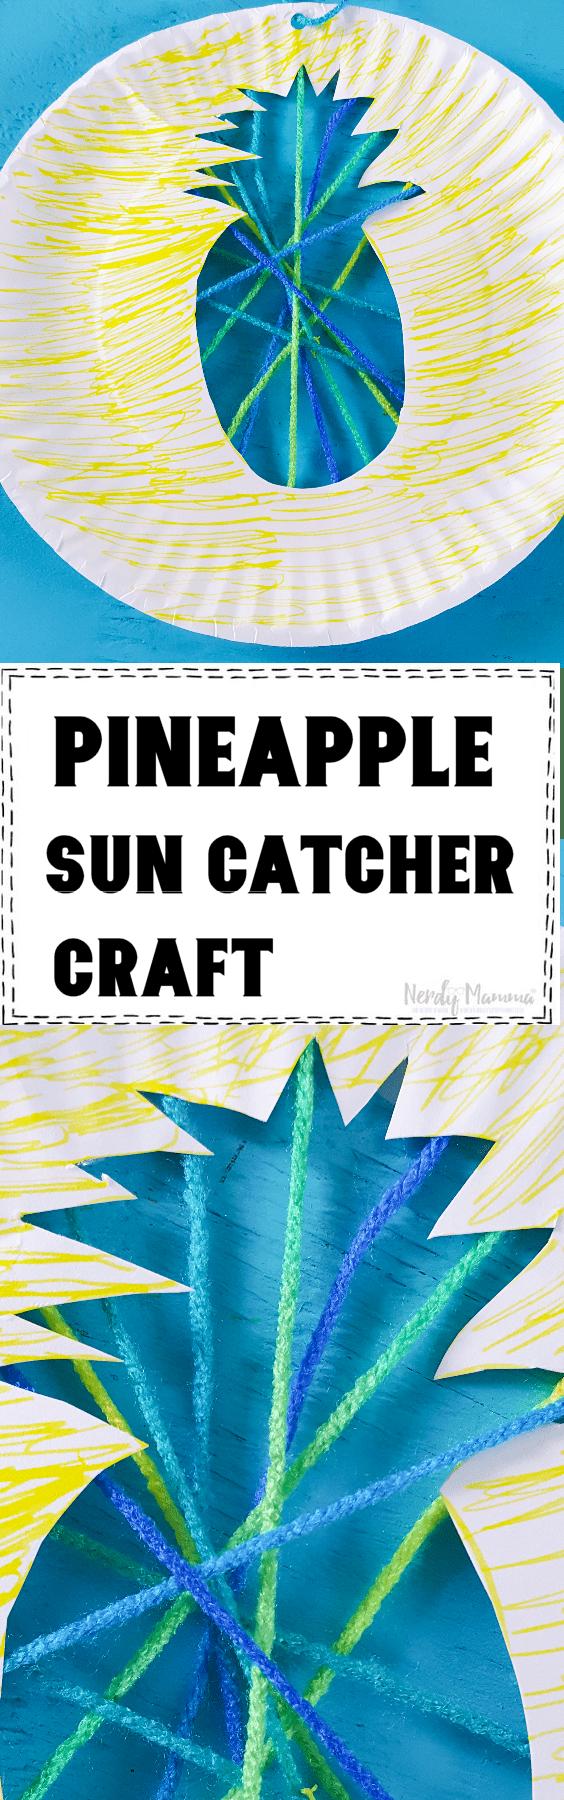 Pineapple Sun Catcher Craft